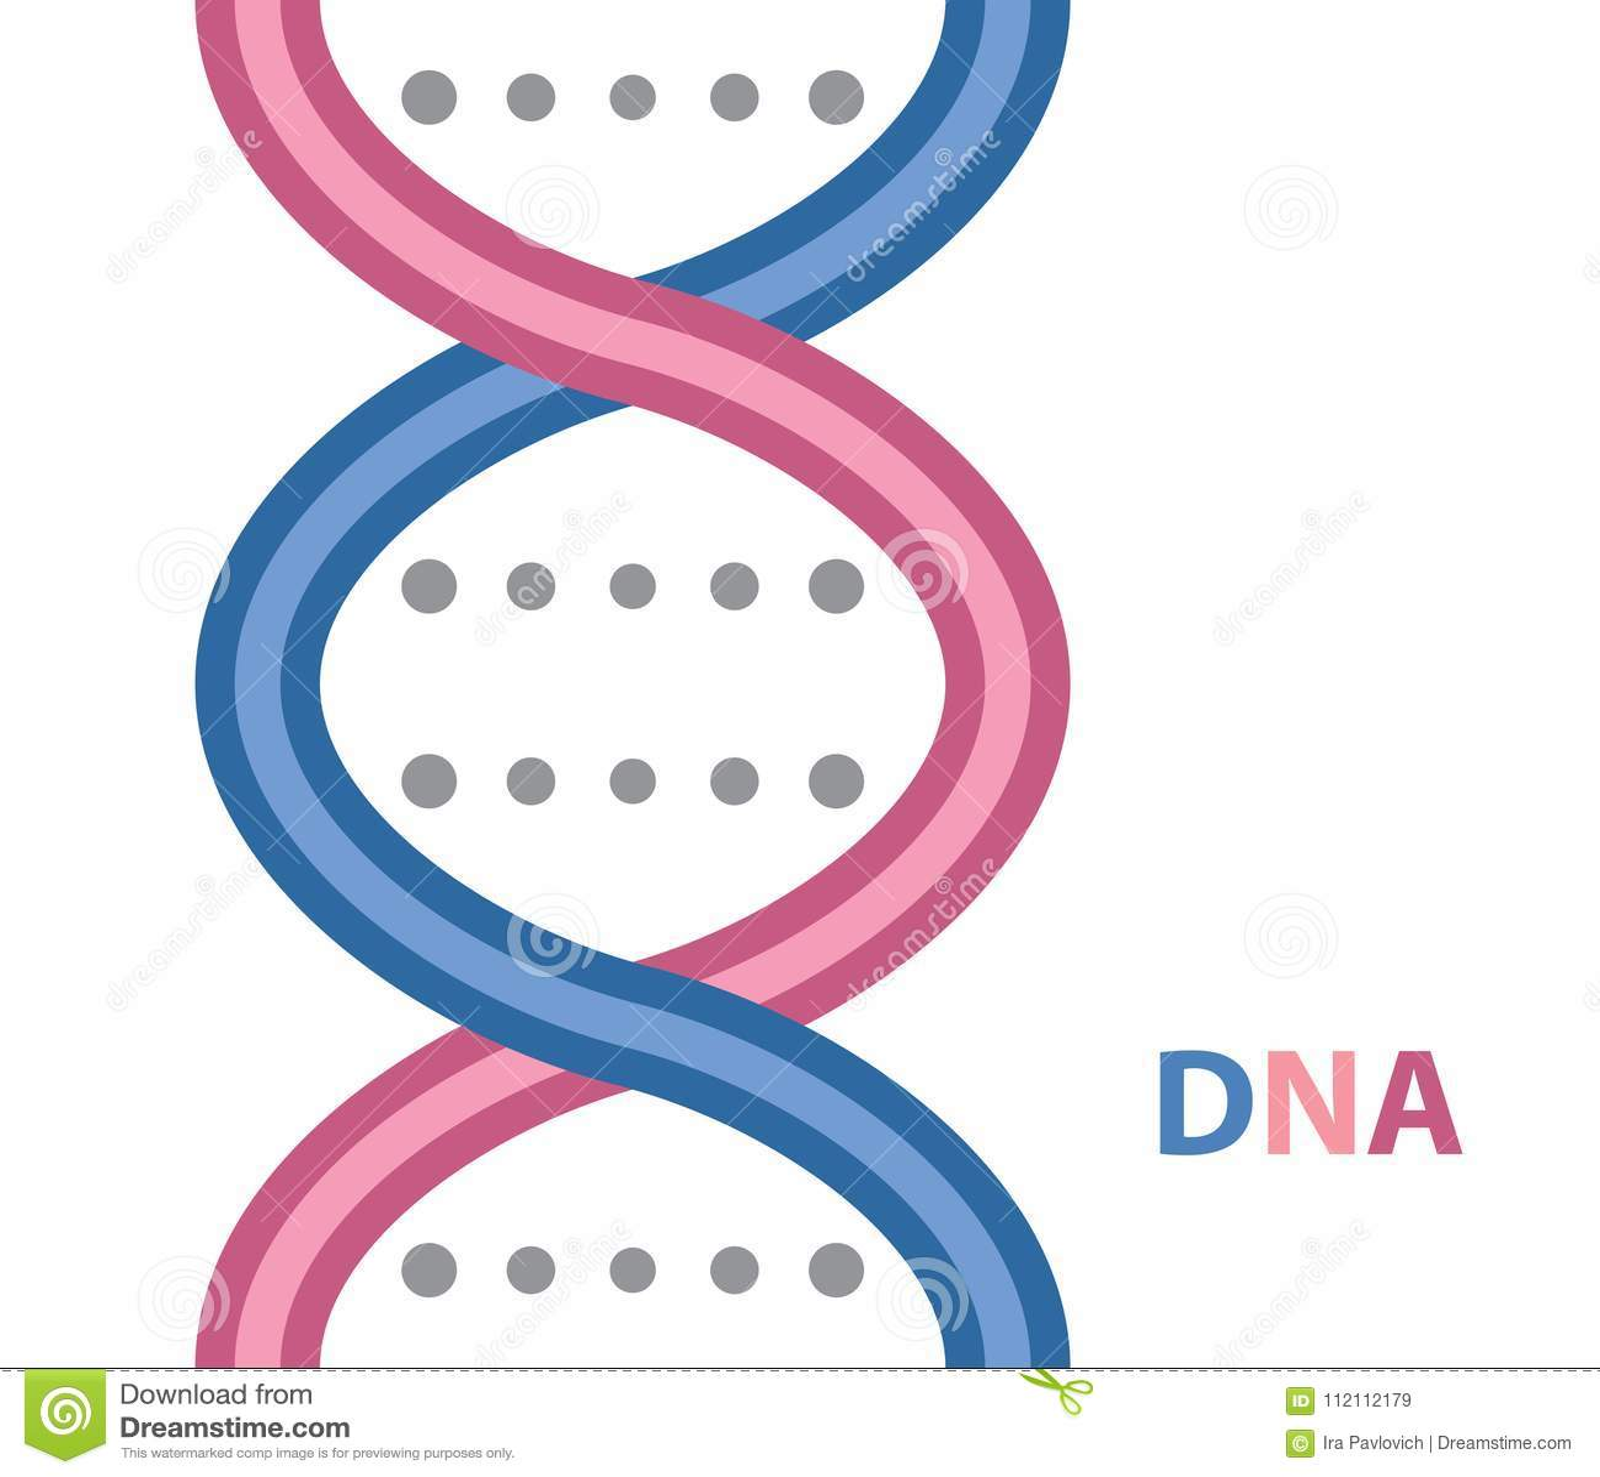 DNA cartoon icon